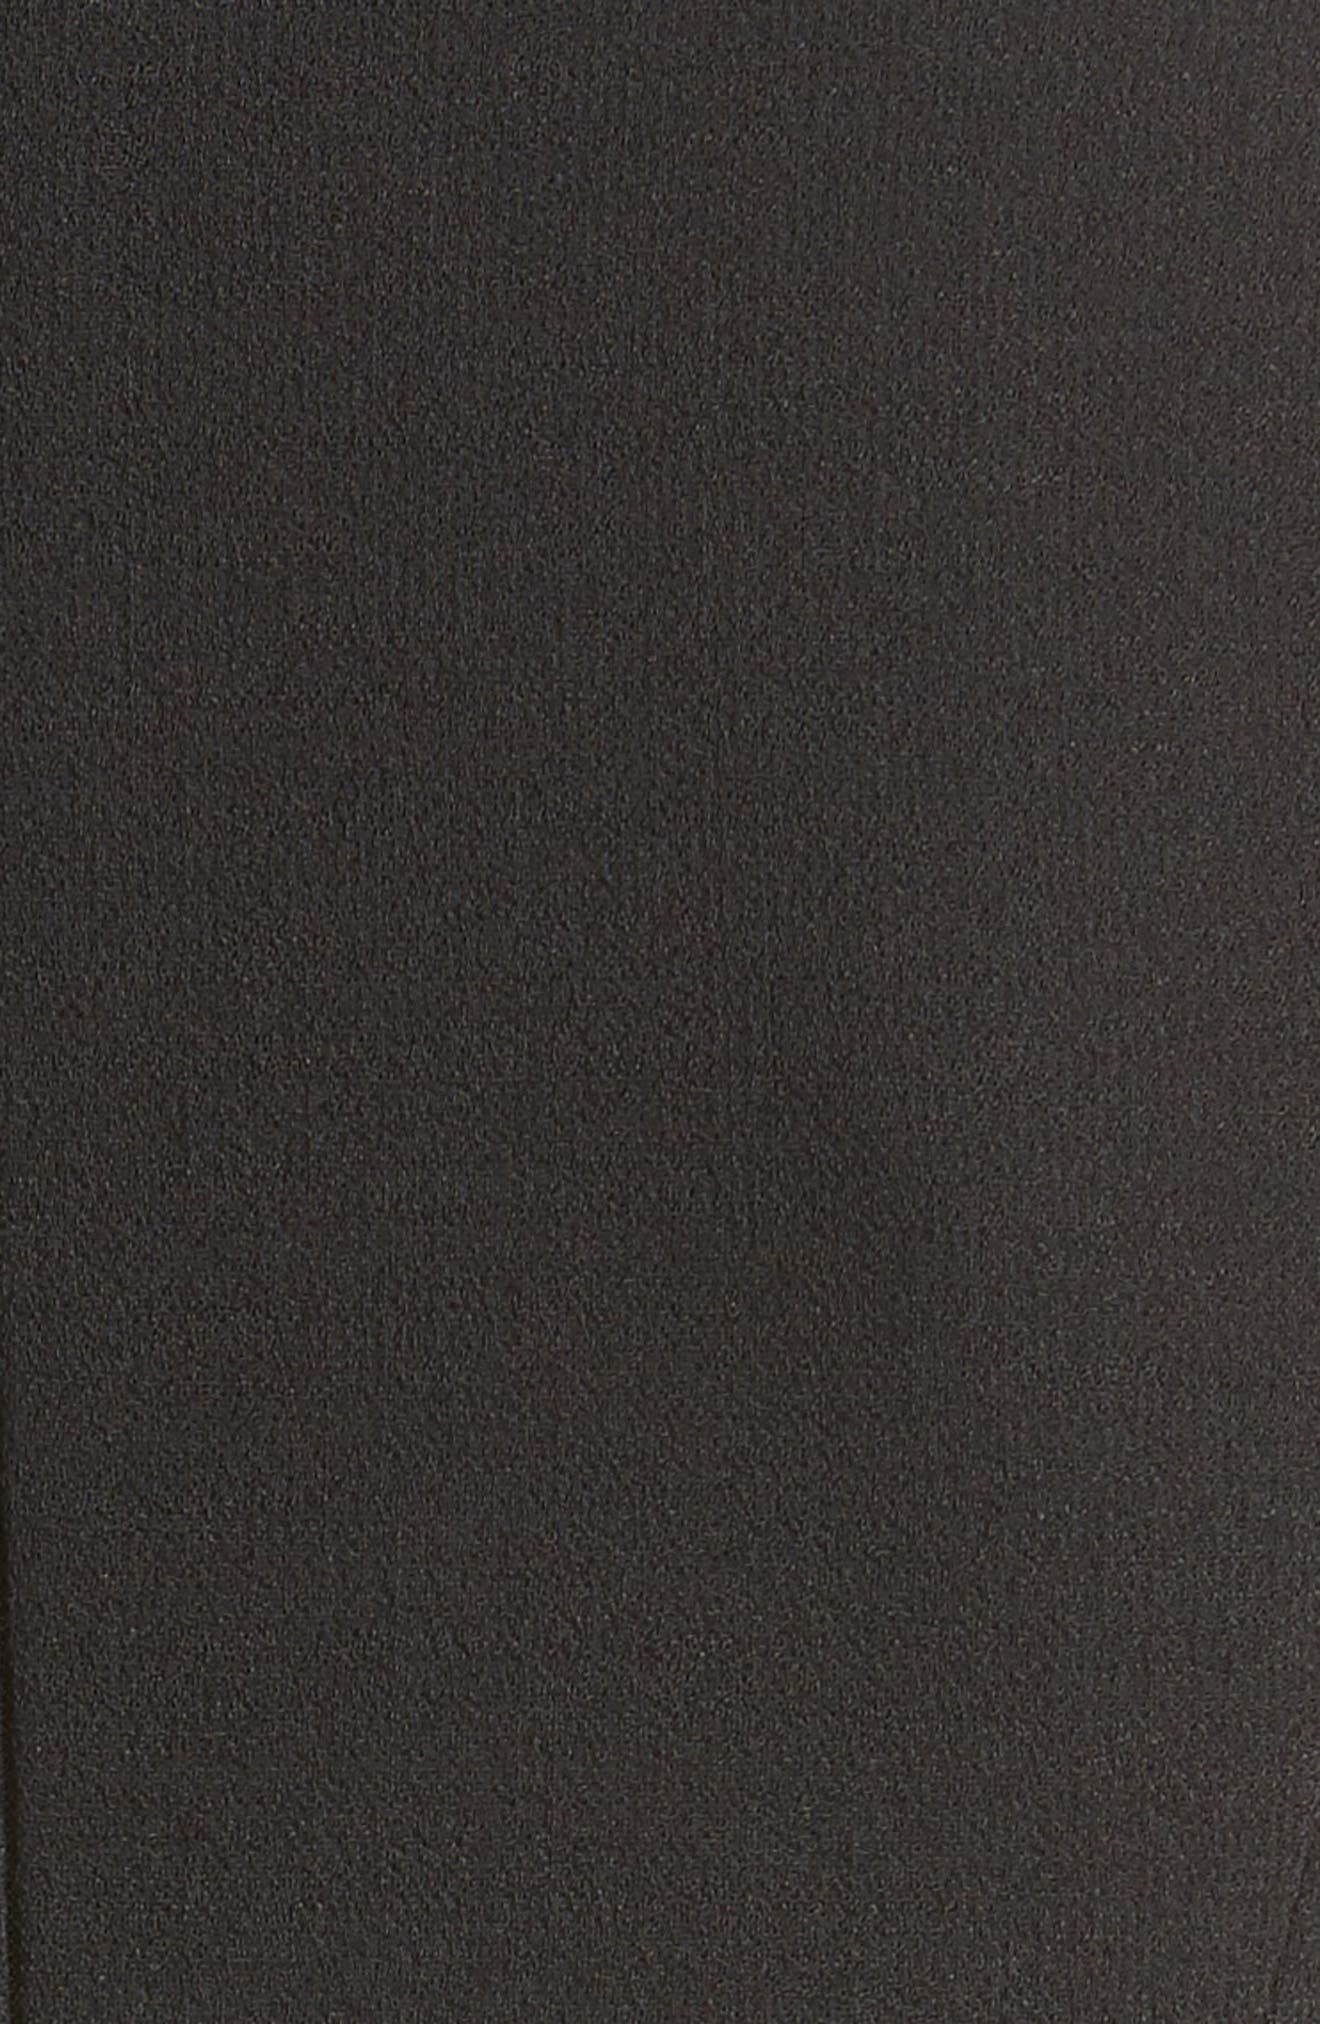 Belted Stretch Bouclé Crepe Sheath Dress,                             Alternate thumbnail 6, color,                             001